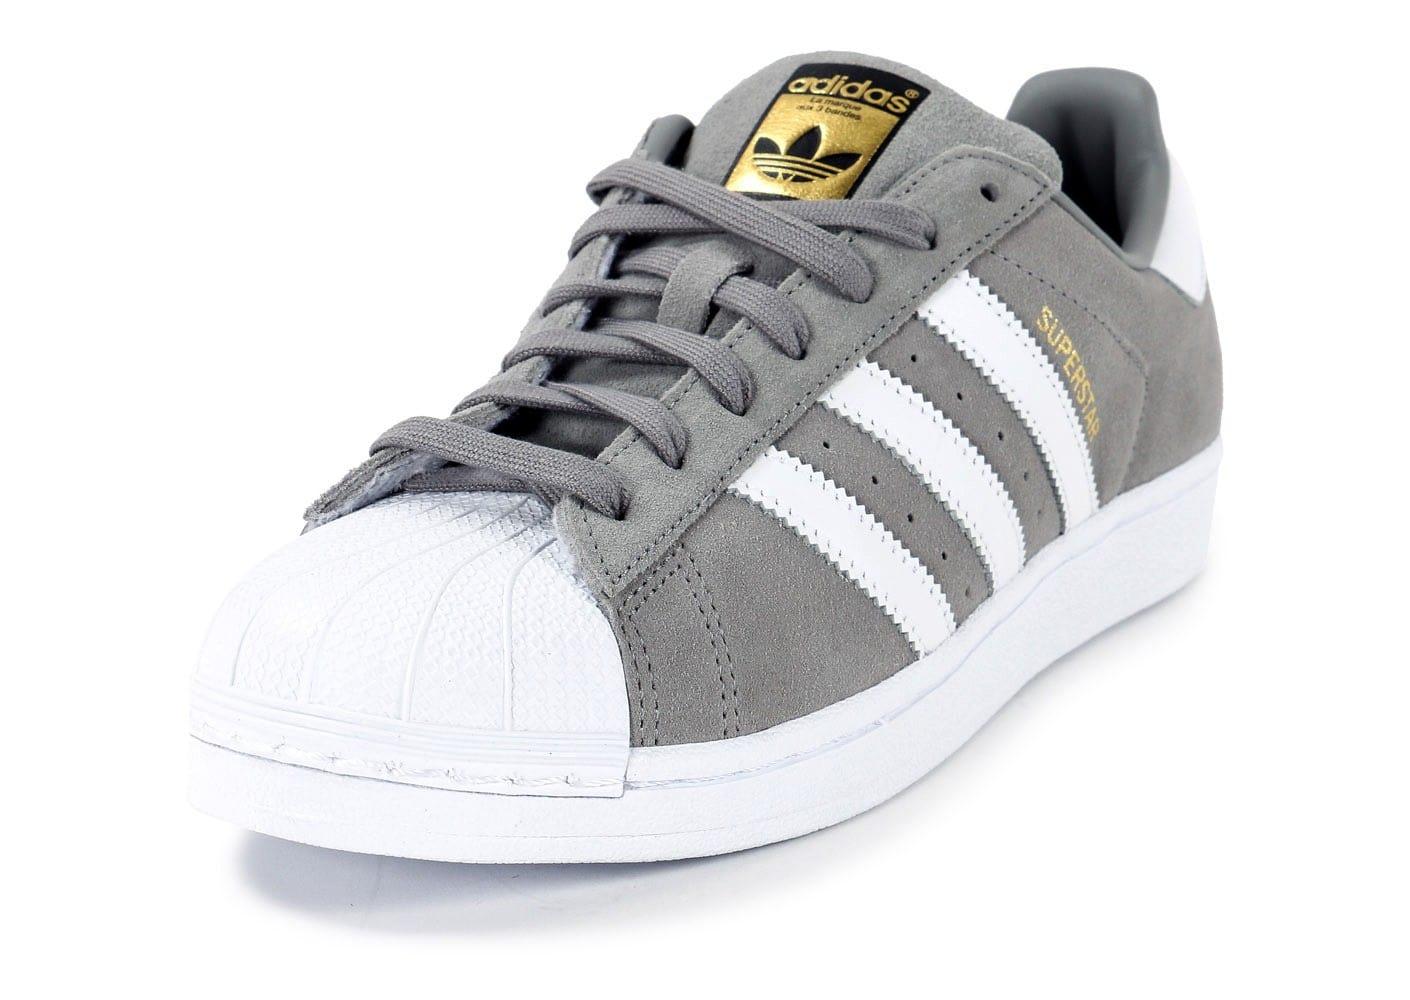 acheter adidas superstar grise,boutique adidas superstar pas